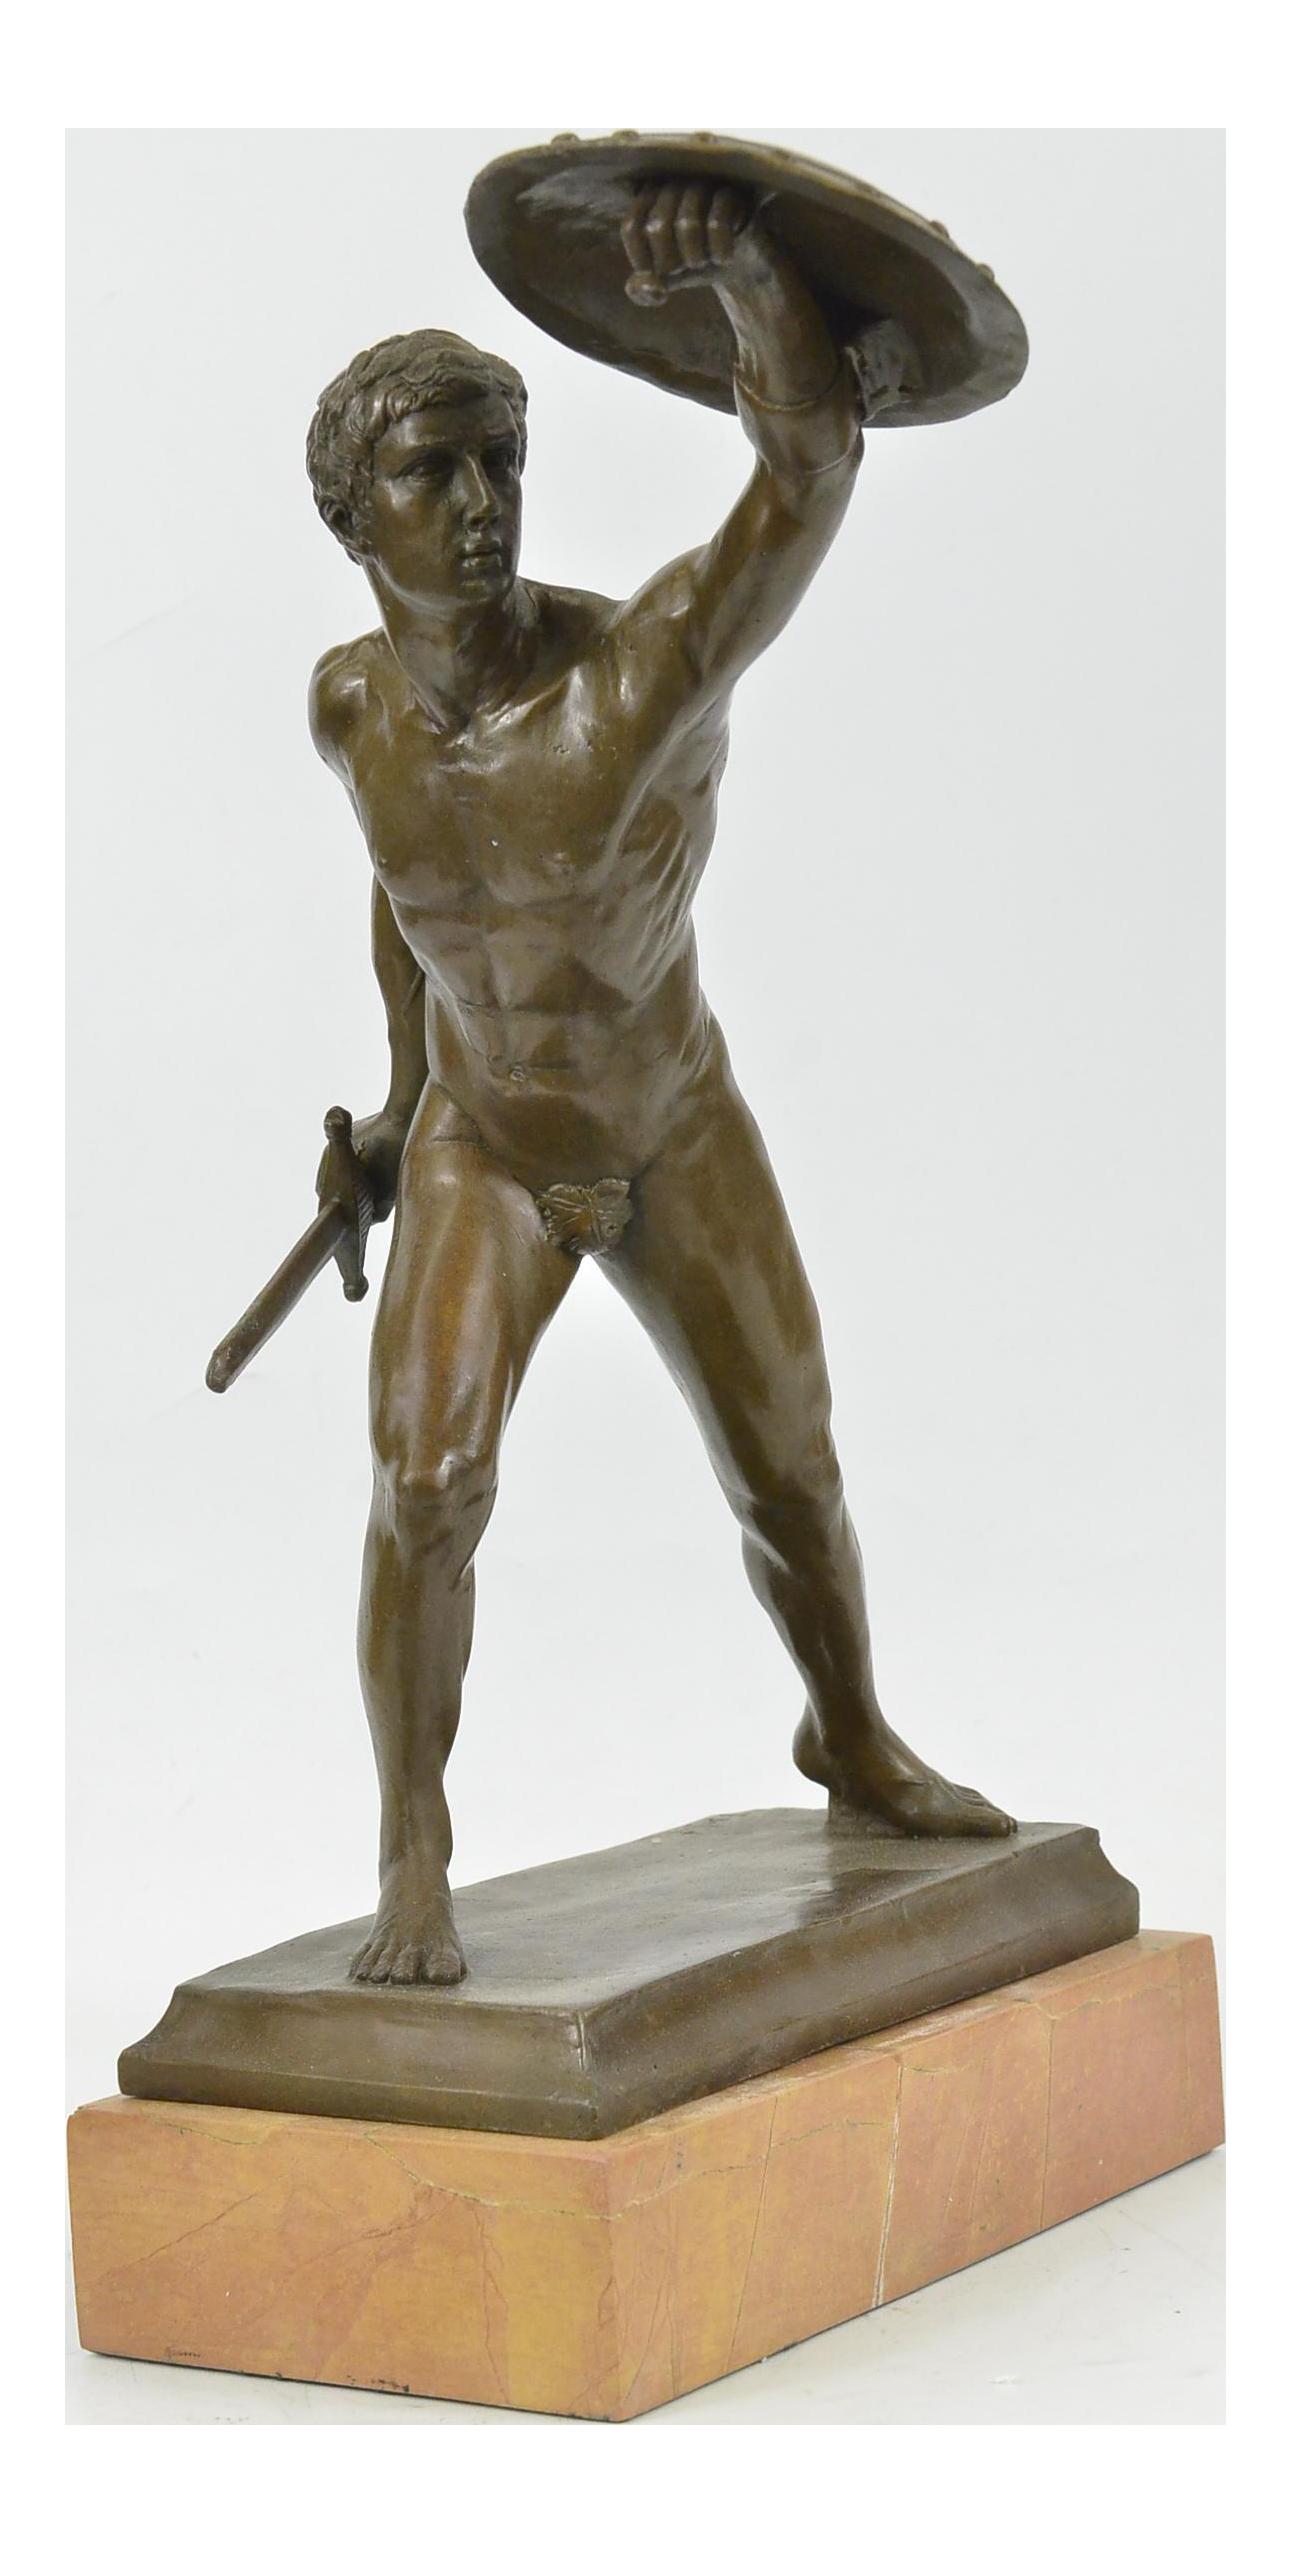 Roman Gladiator Bronze Statue On Marble Base Sculpture